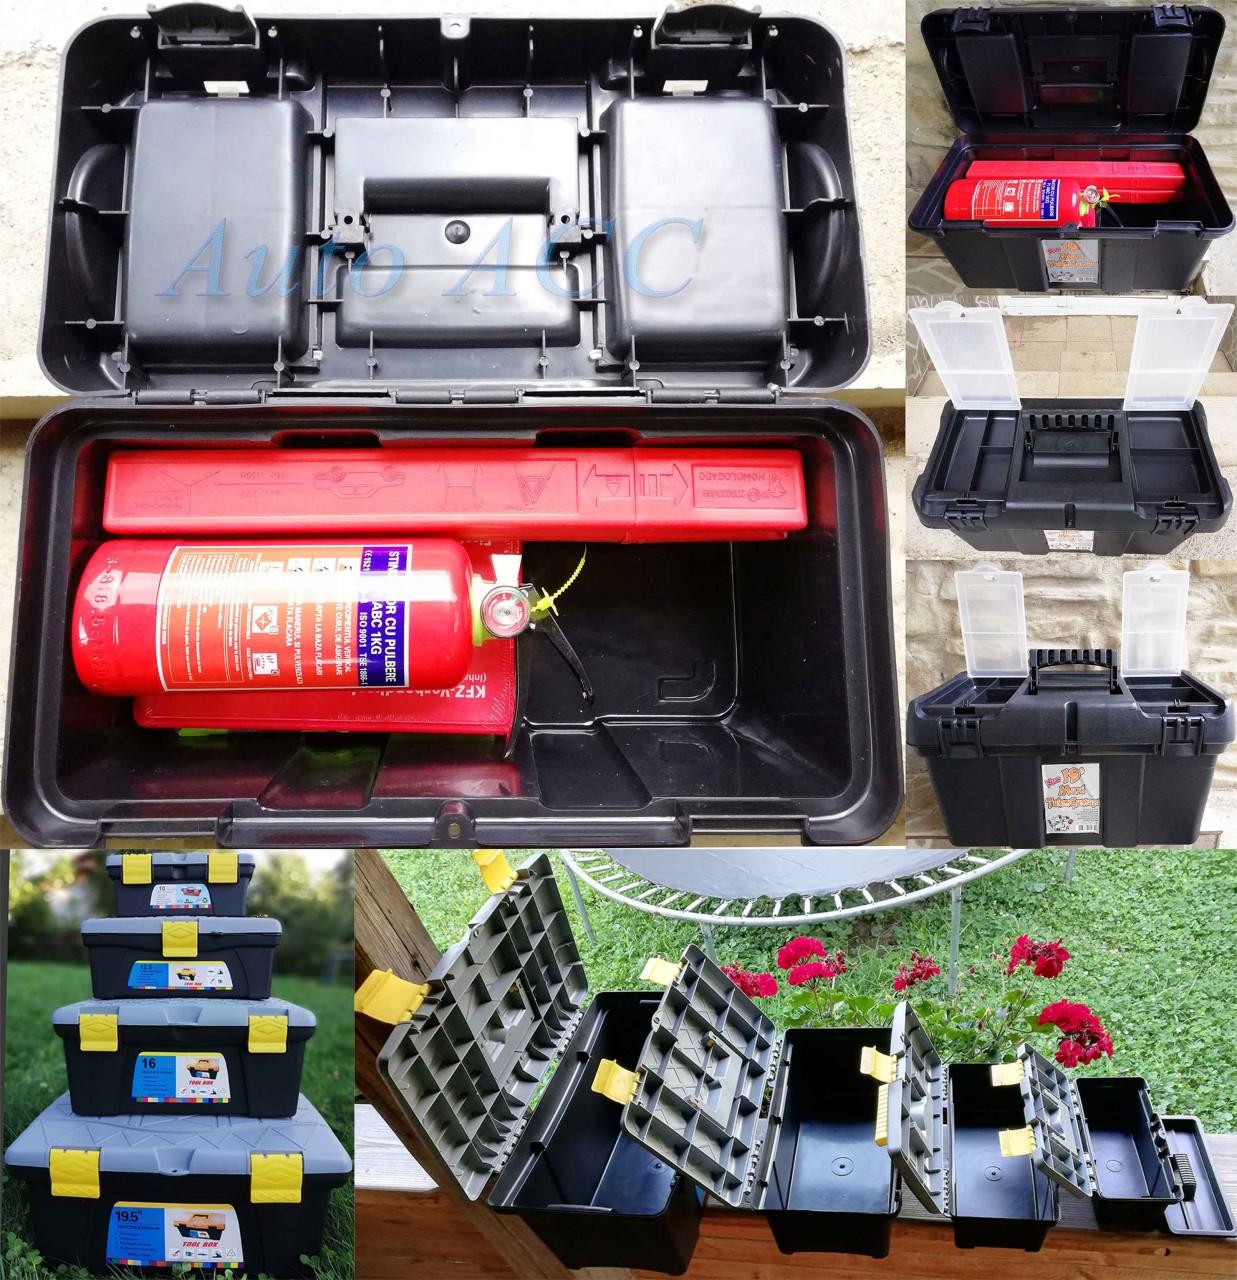 Roata Rezerva + Cric + Cheie roti + Compresor + Spray Anvelope - Pachete complete pentru pana